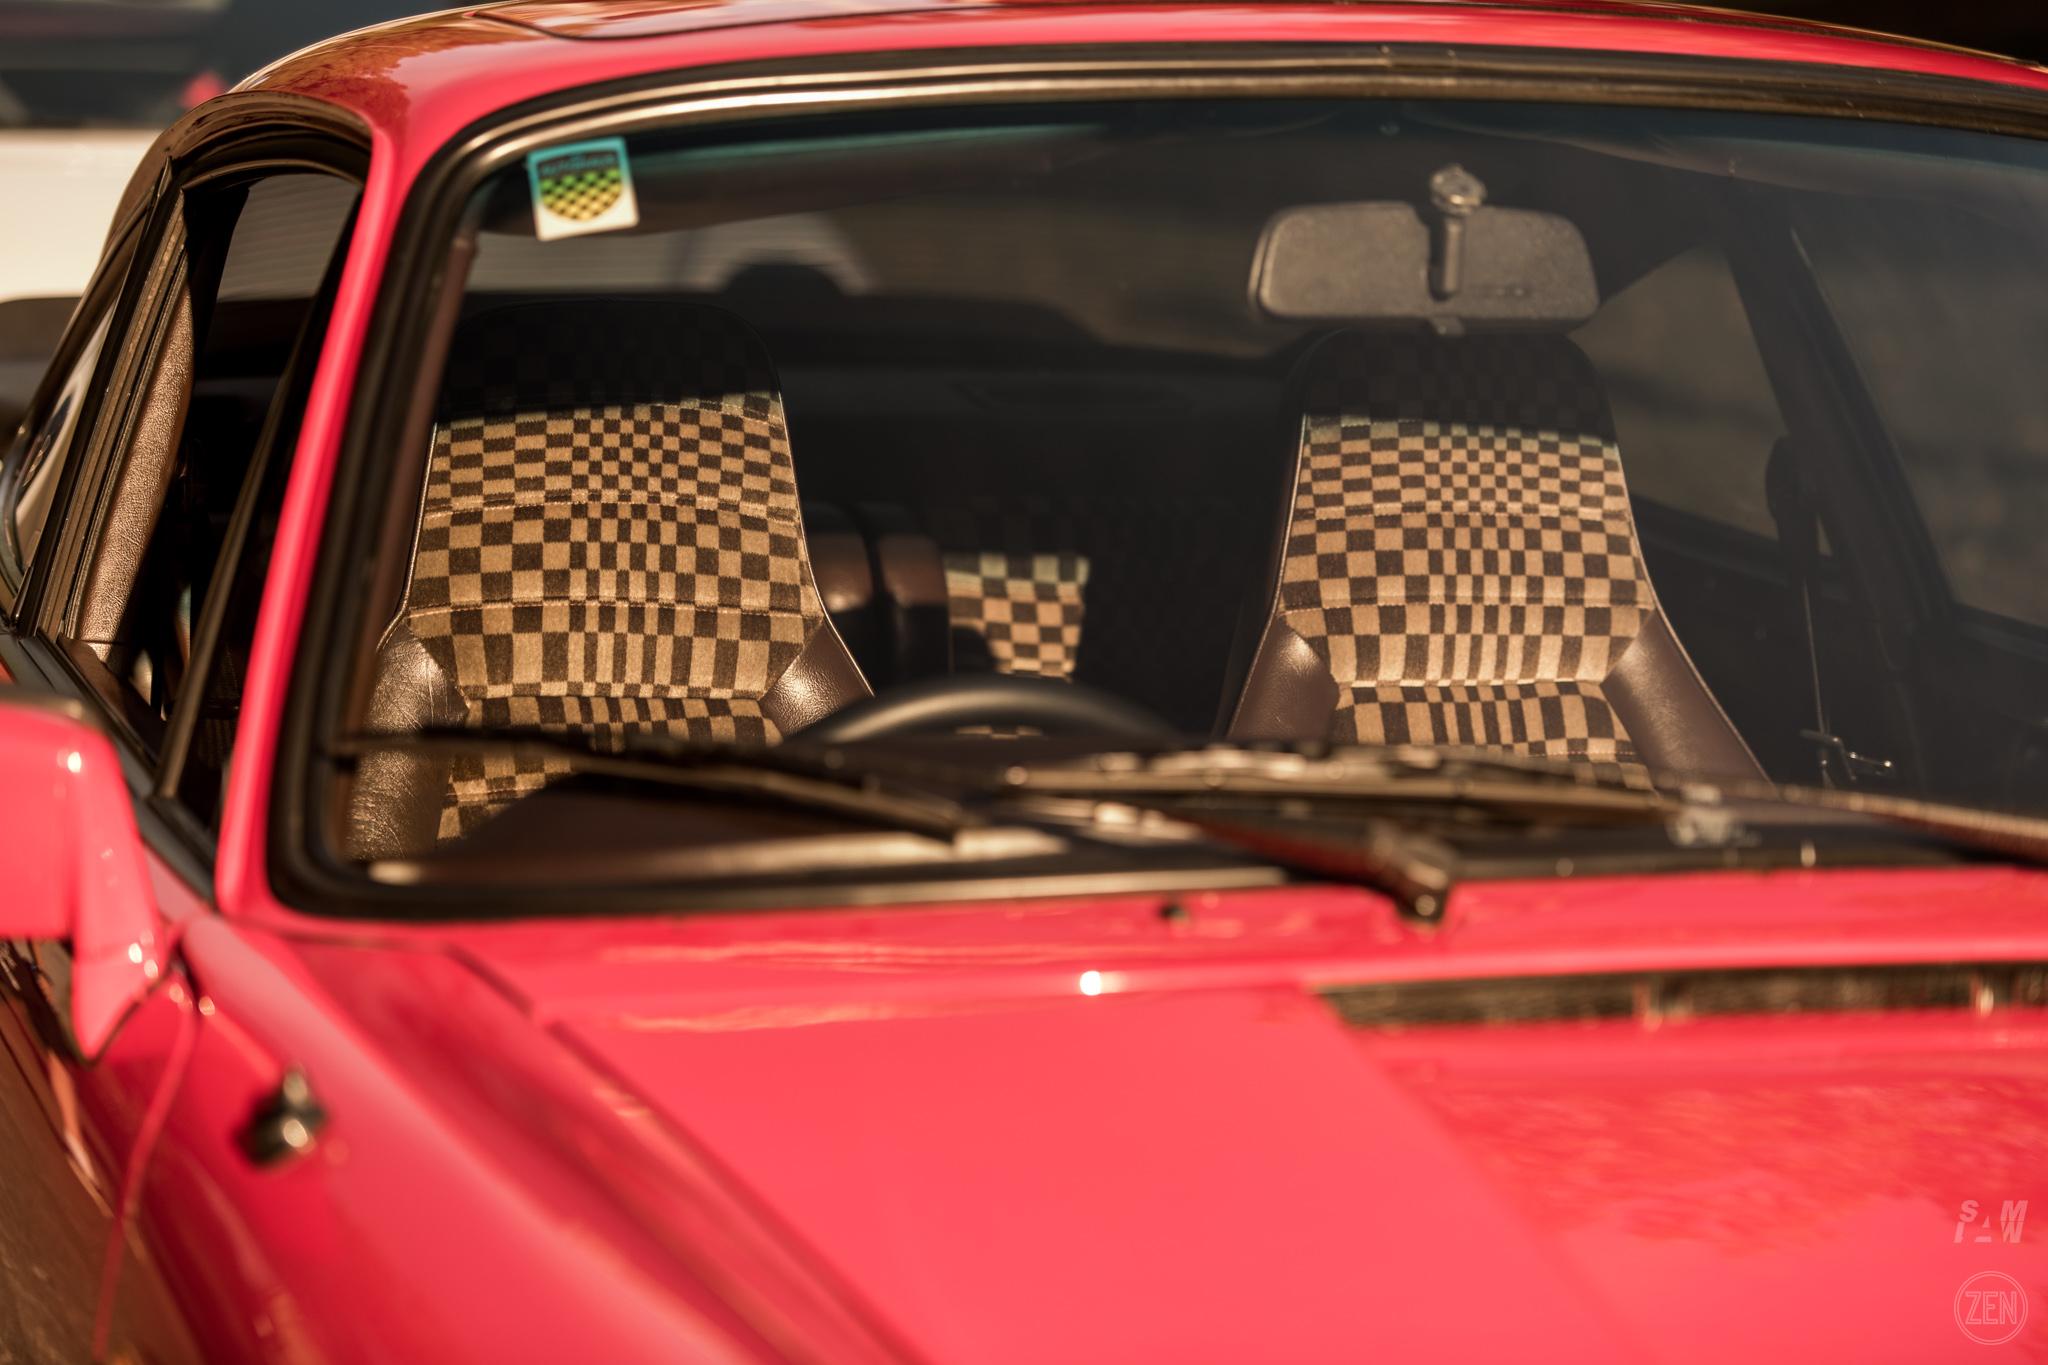 2019-10-27 - Autohaus Porsches & Coffee 085